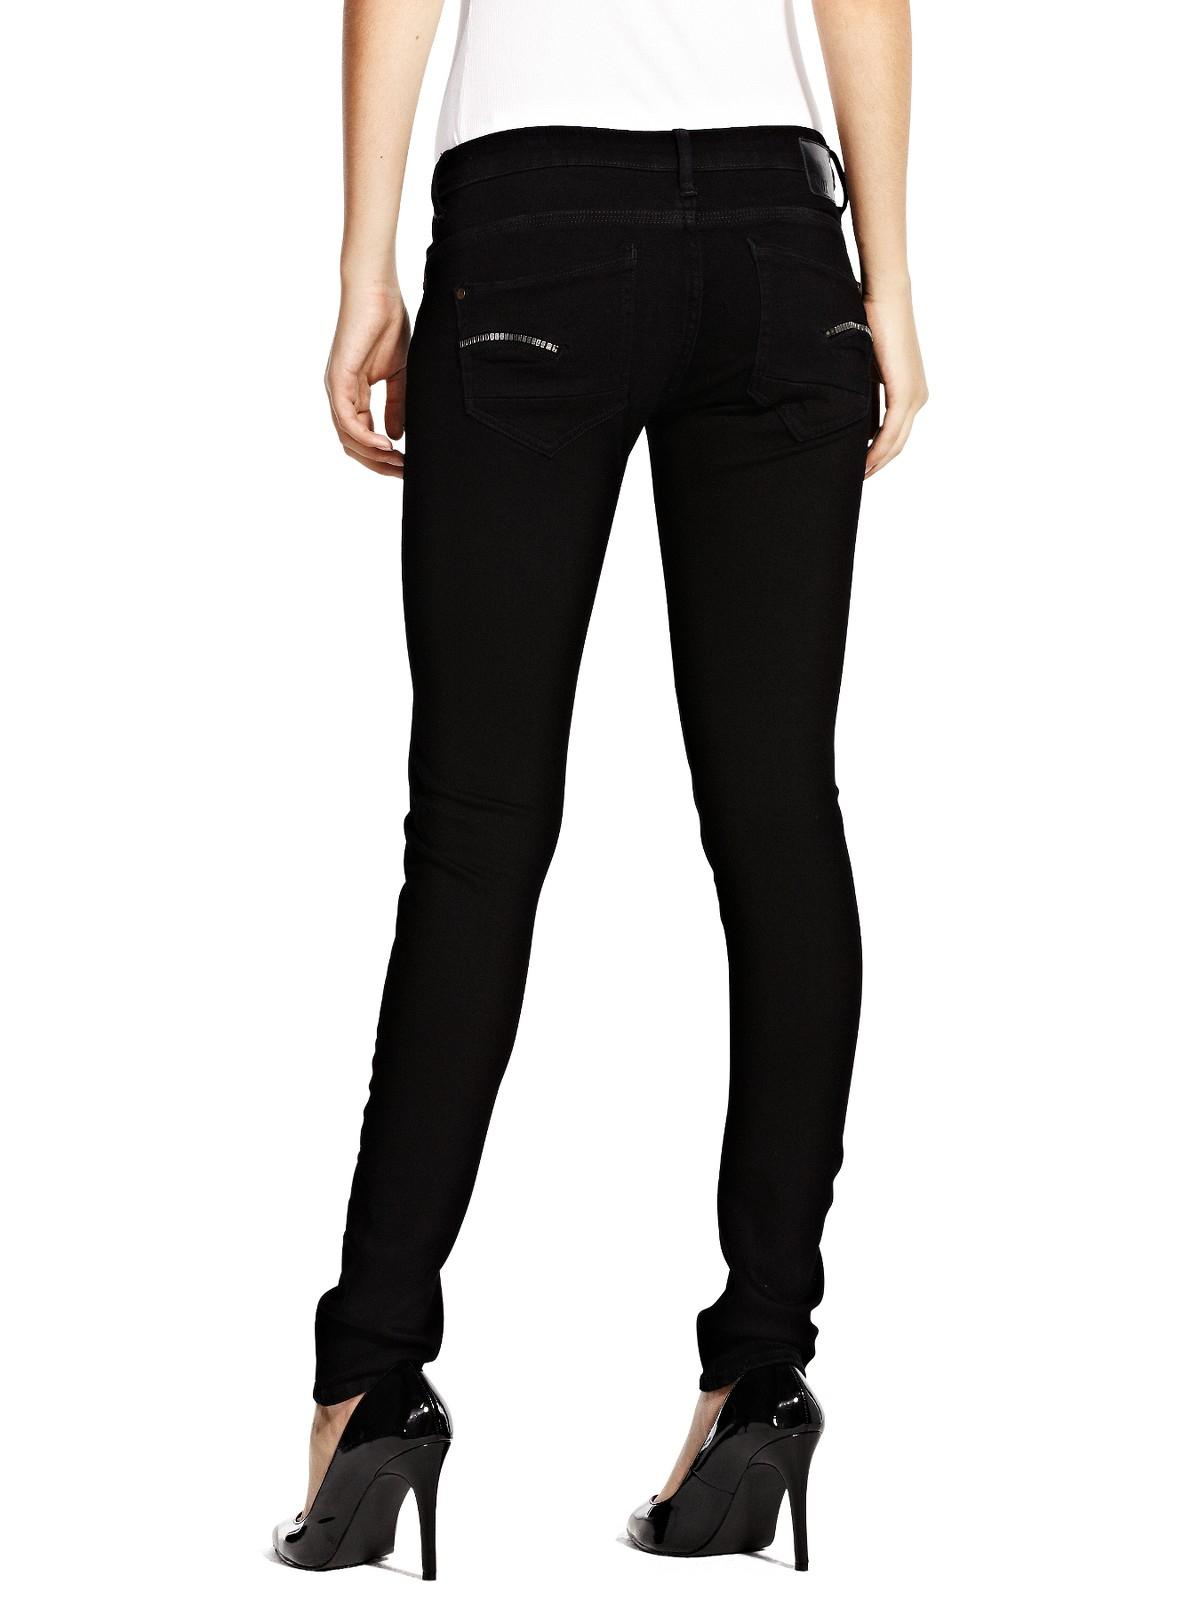 star raw gstar raw radar smith skinny jeans raw in black raw. Black Bedroom Furniture Sets. Home Design Ideas